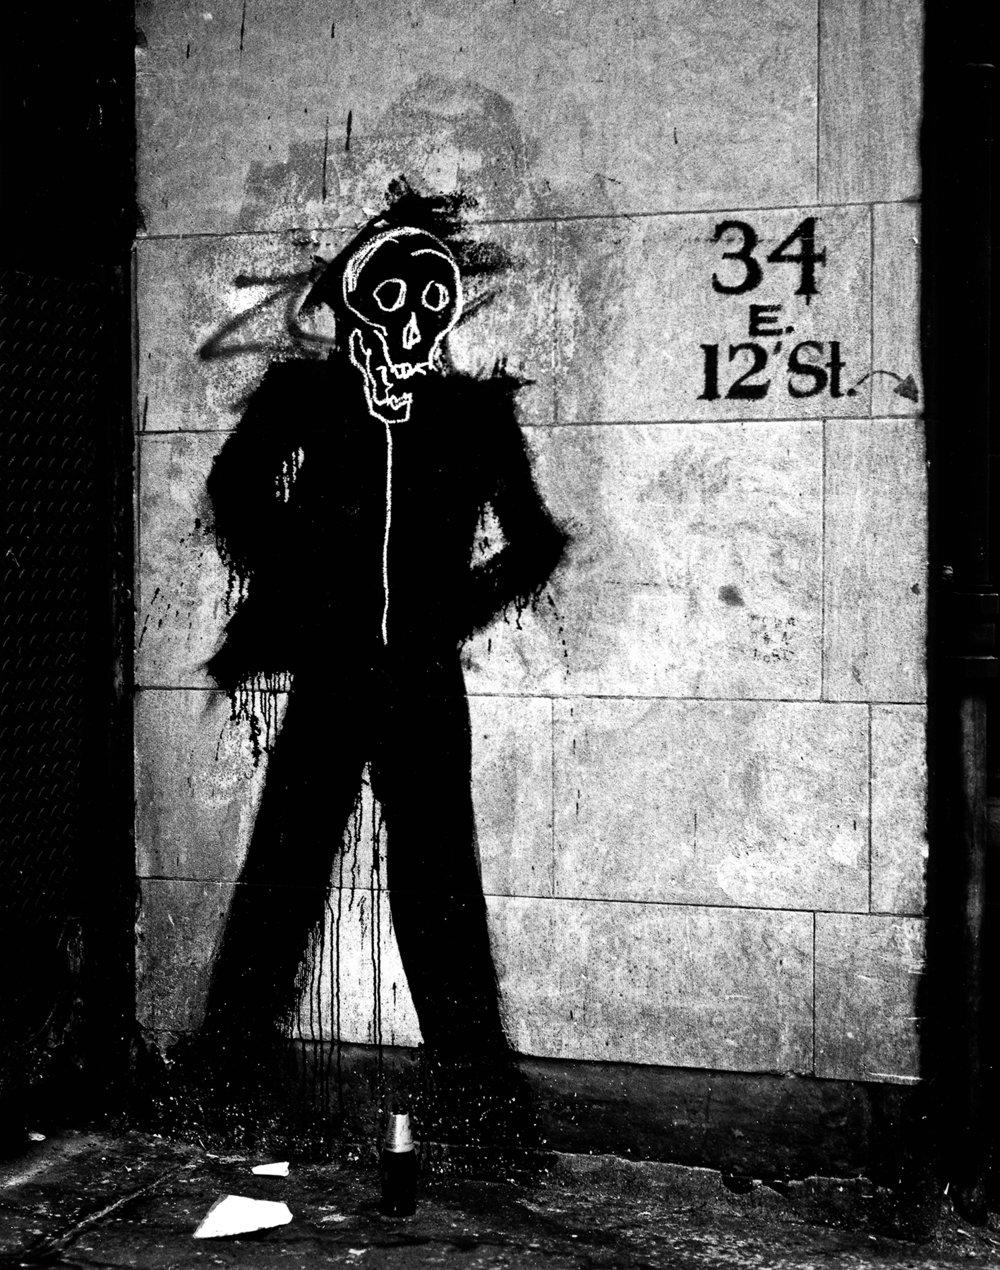 34 E 12